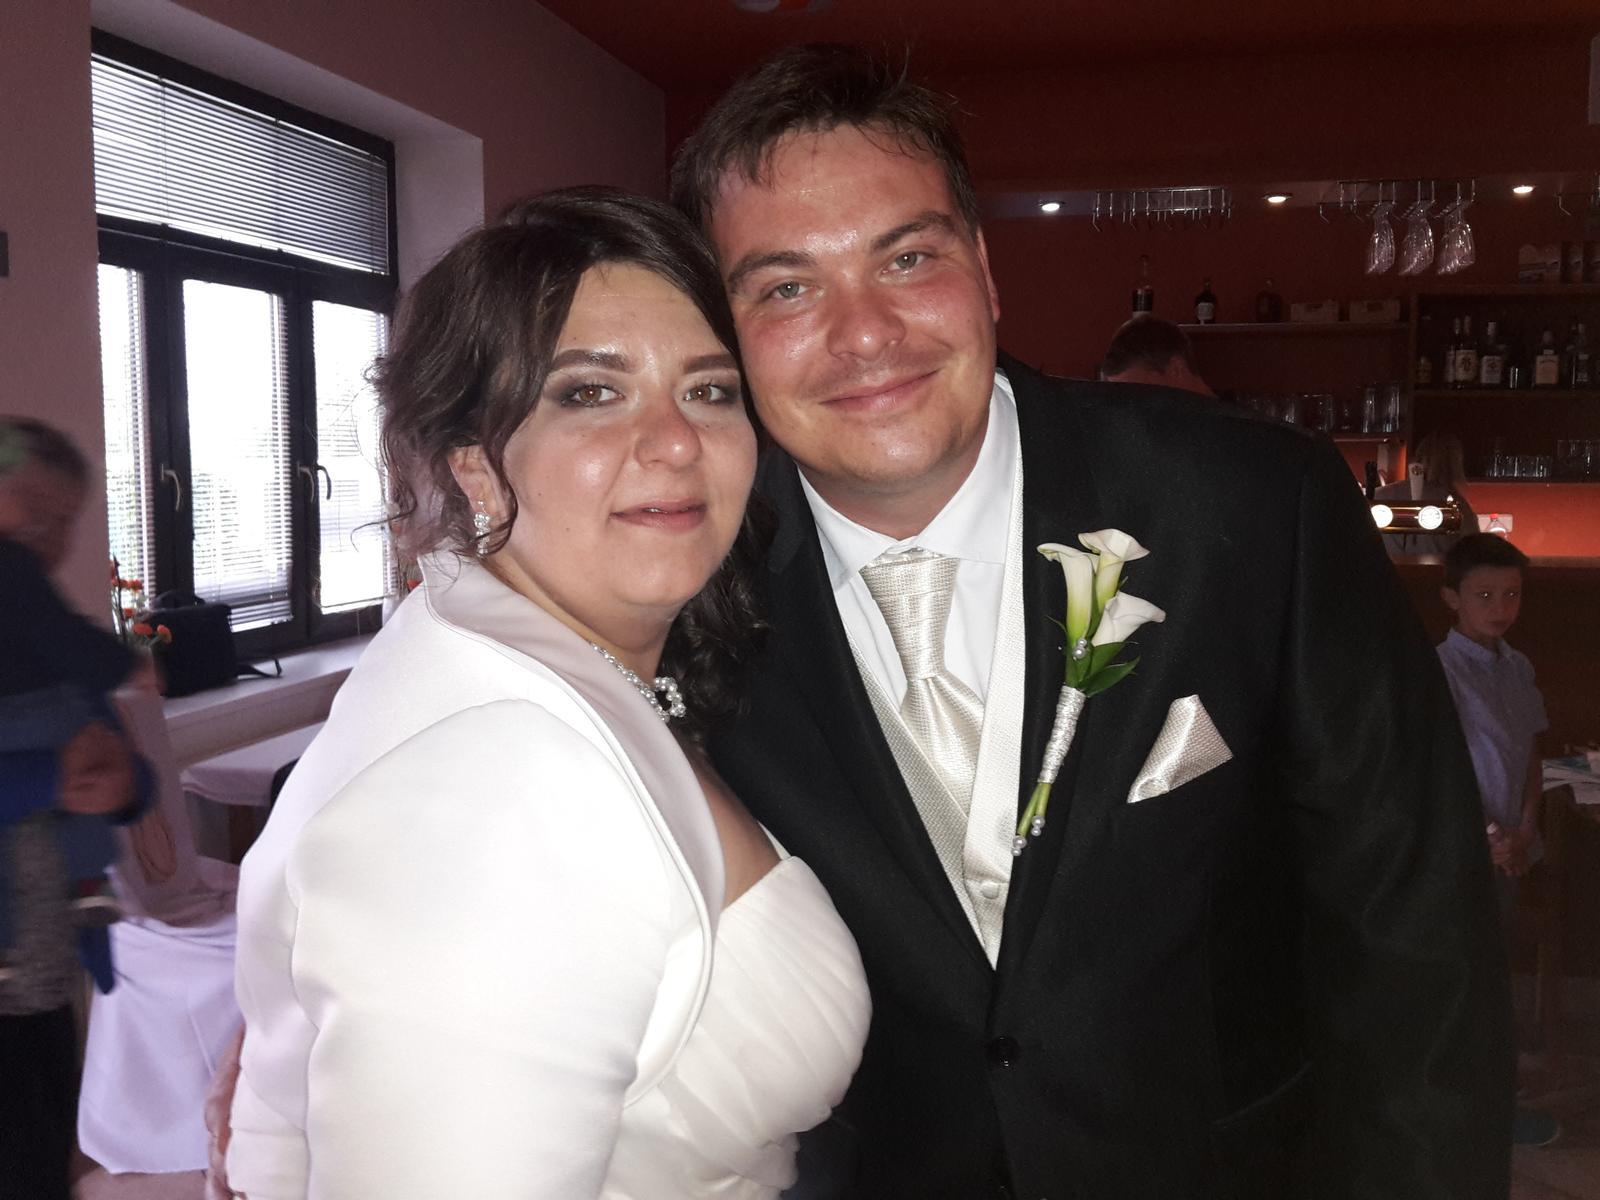 Svatební páry - BOSÁCI - Manželé Štajnarovi